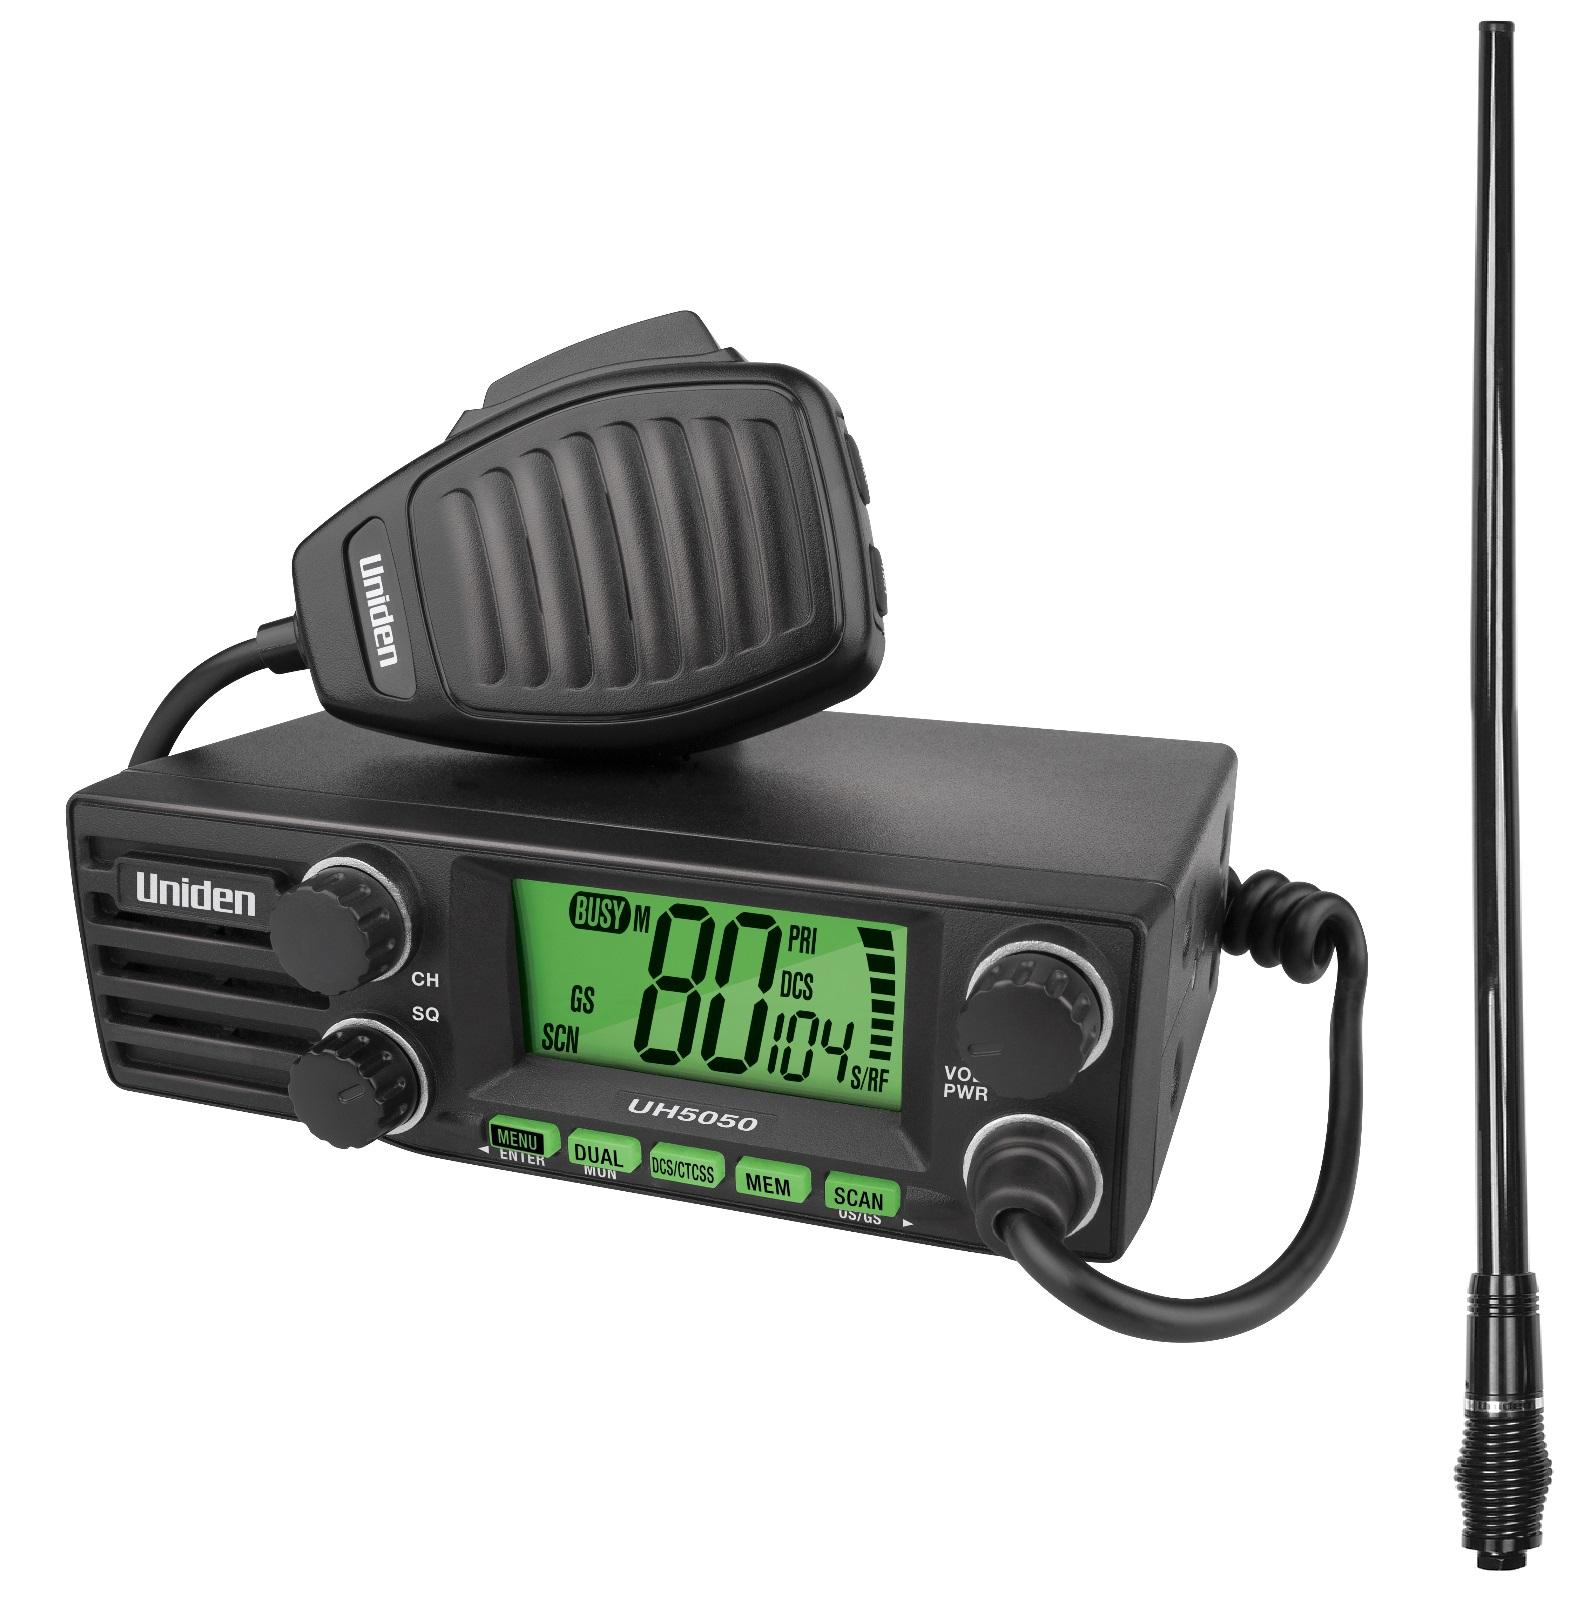 NEW AXIS Marine Caravan 27mhz CB Radio Antenna